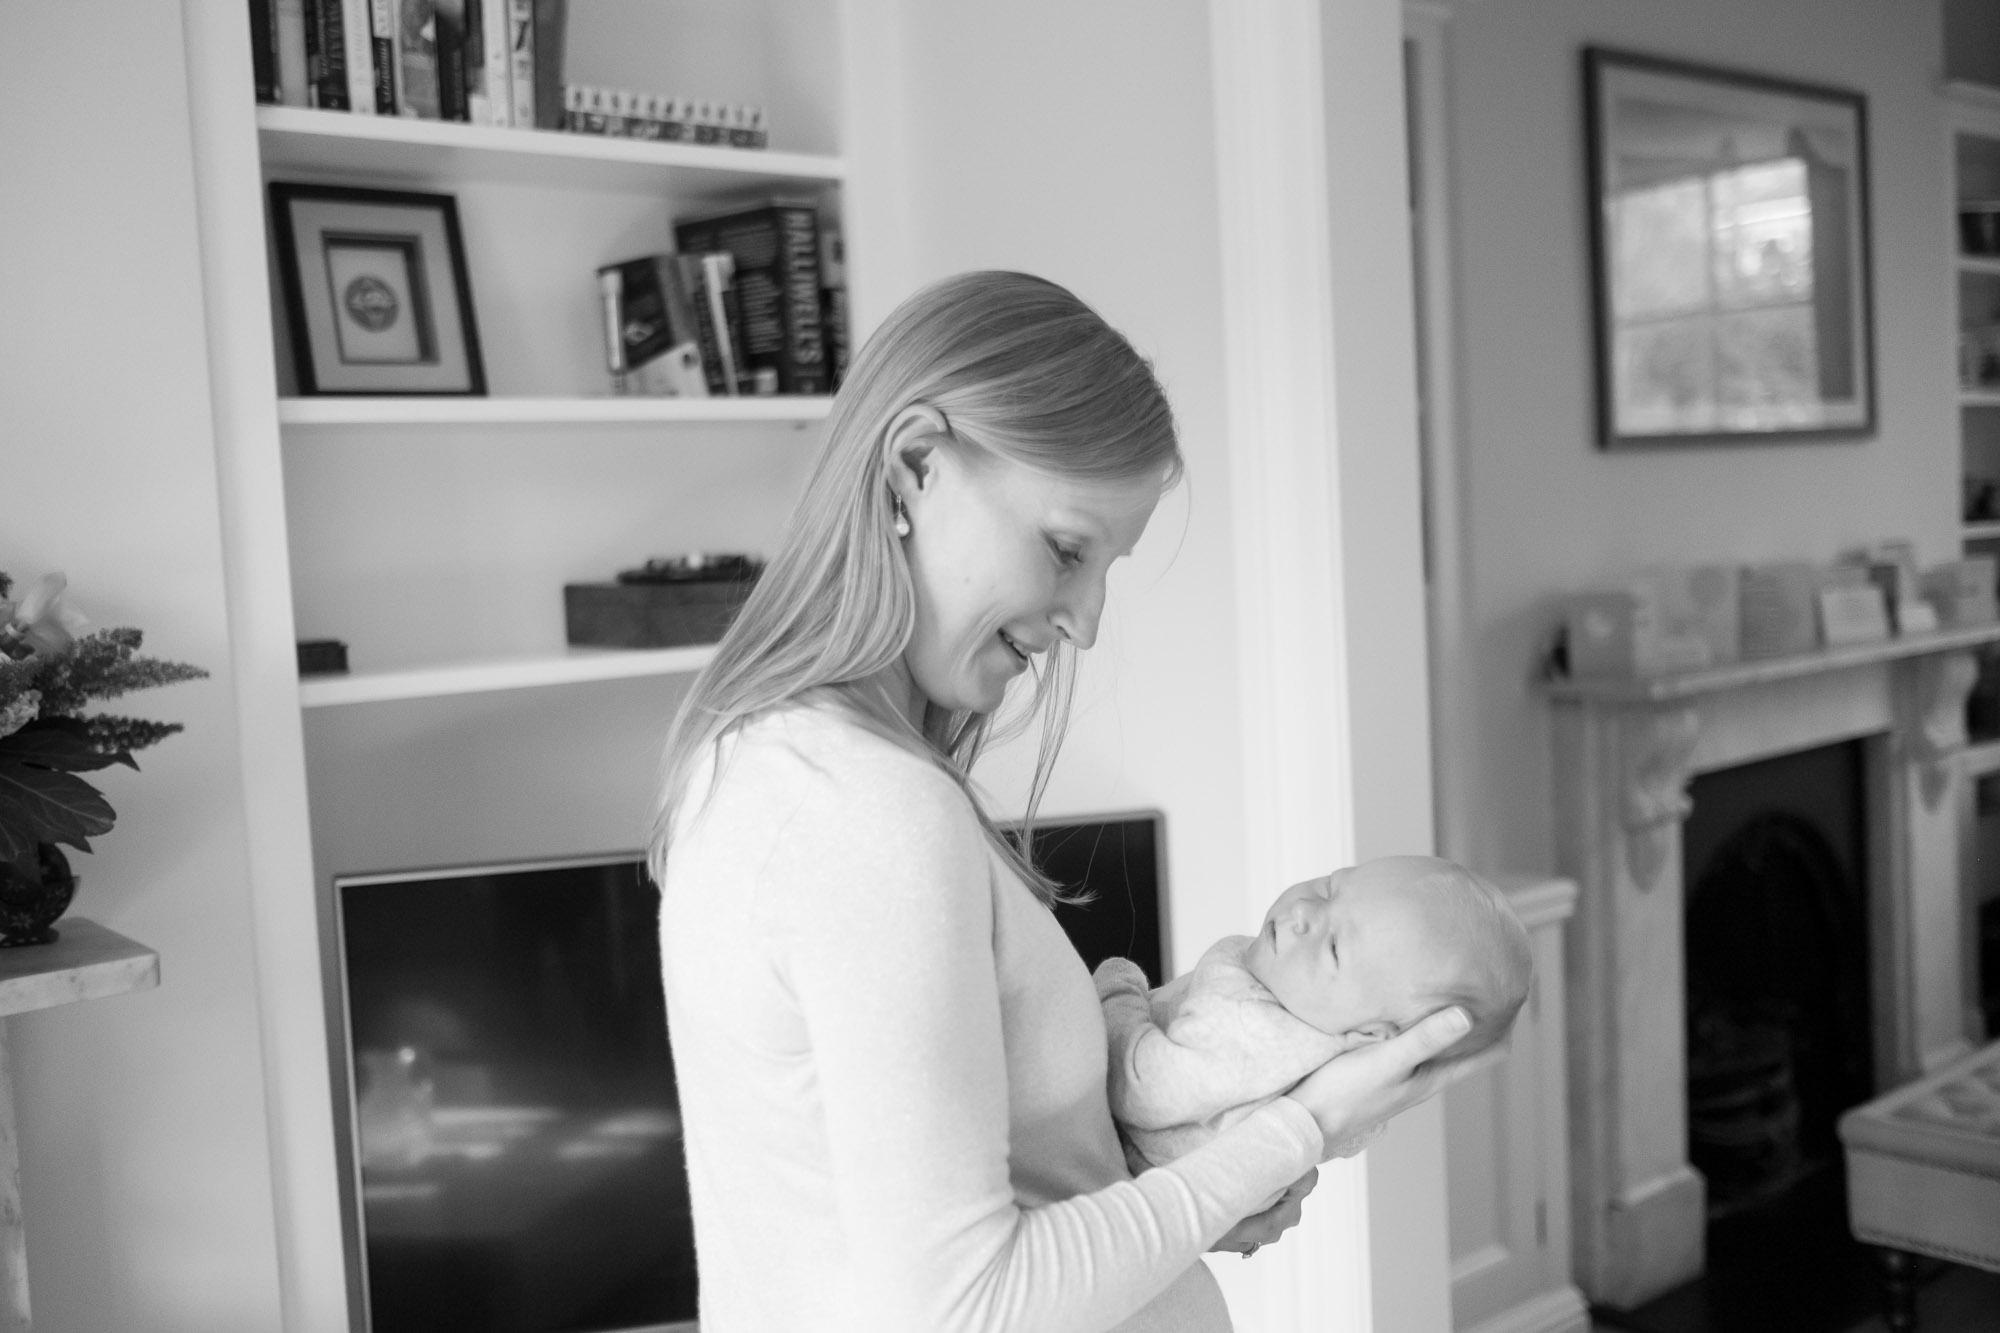 newborn-baby-family-portrait-photographer-010.jpg